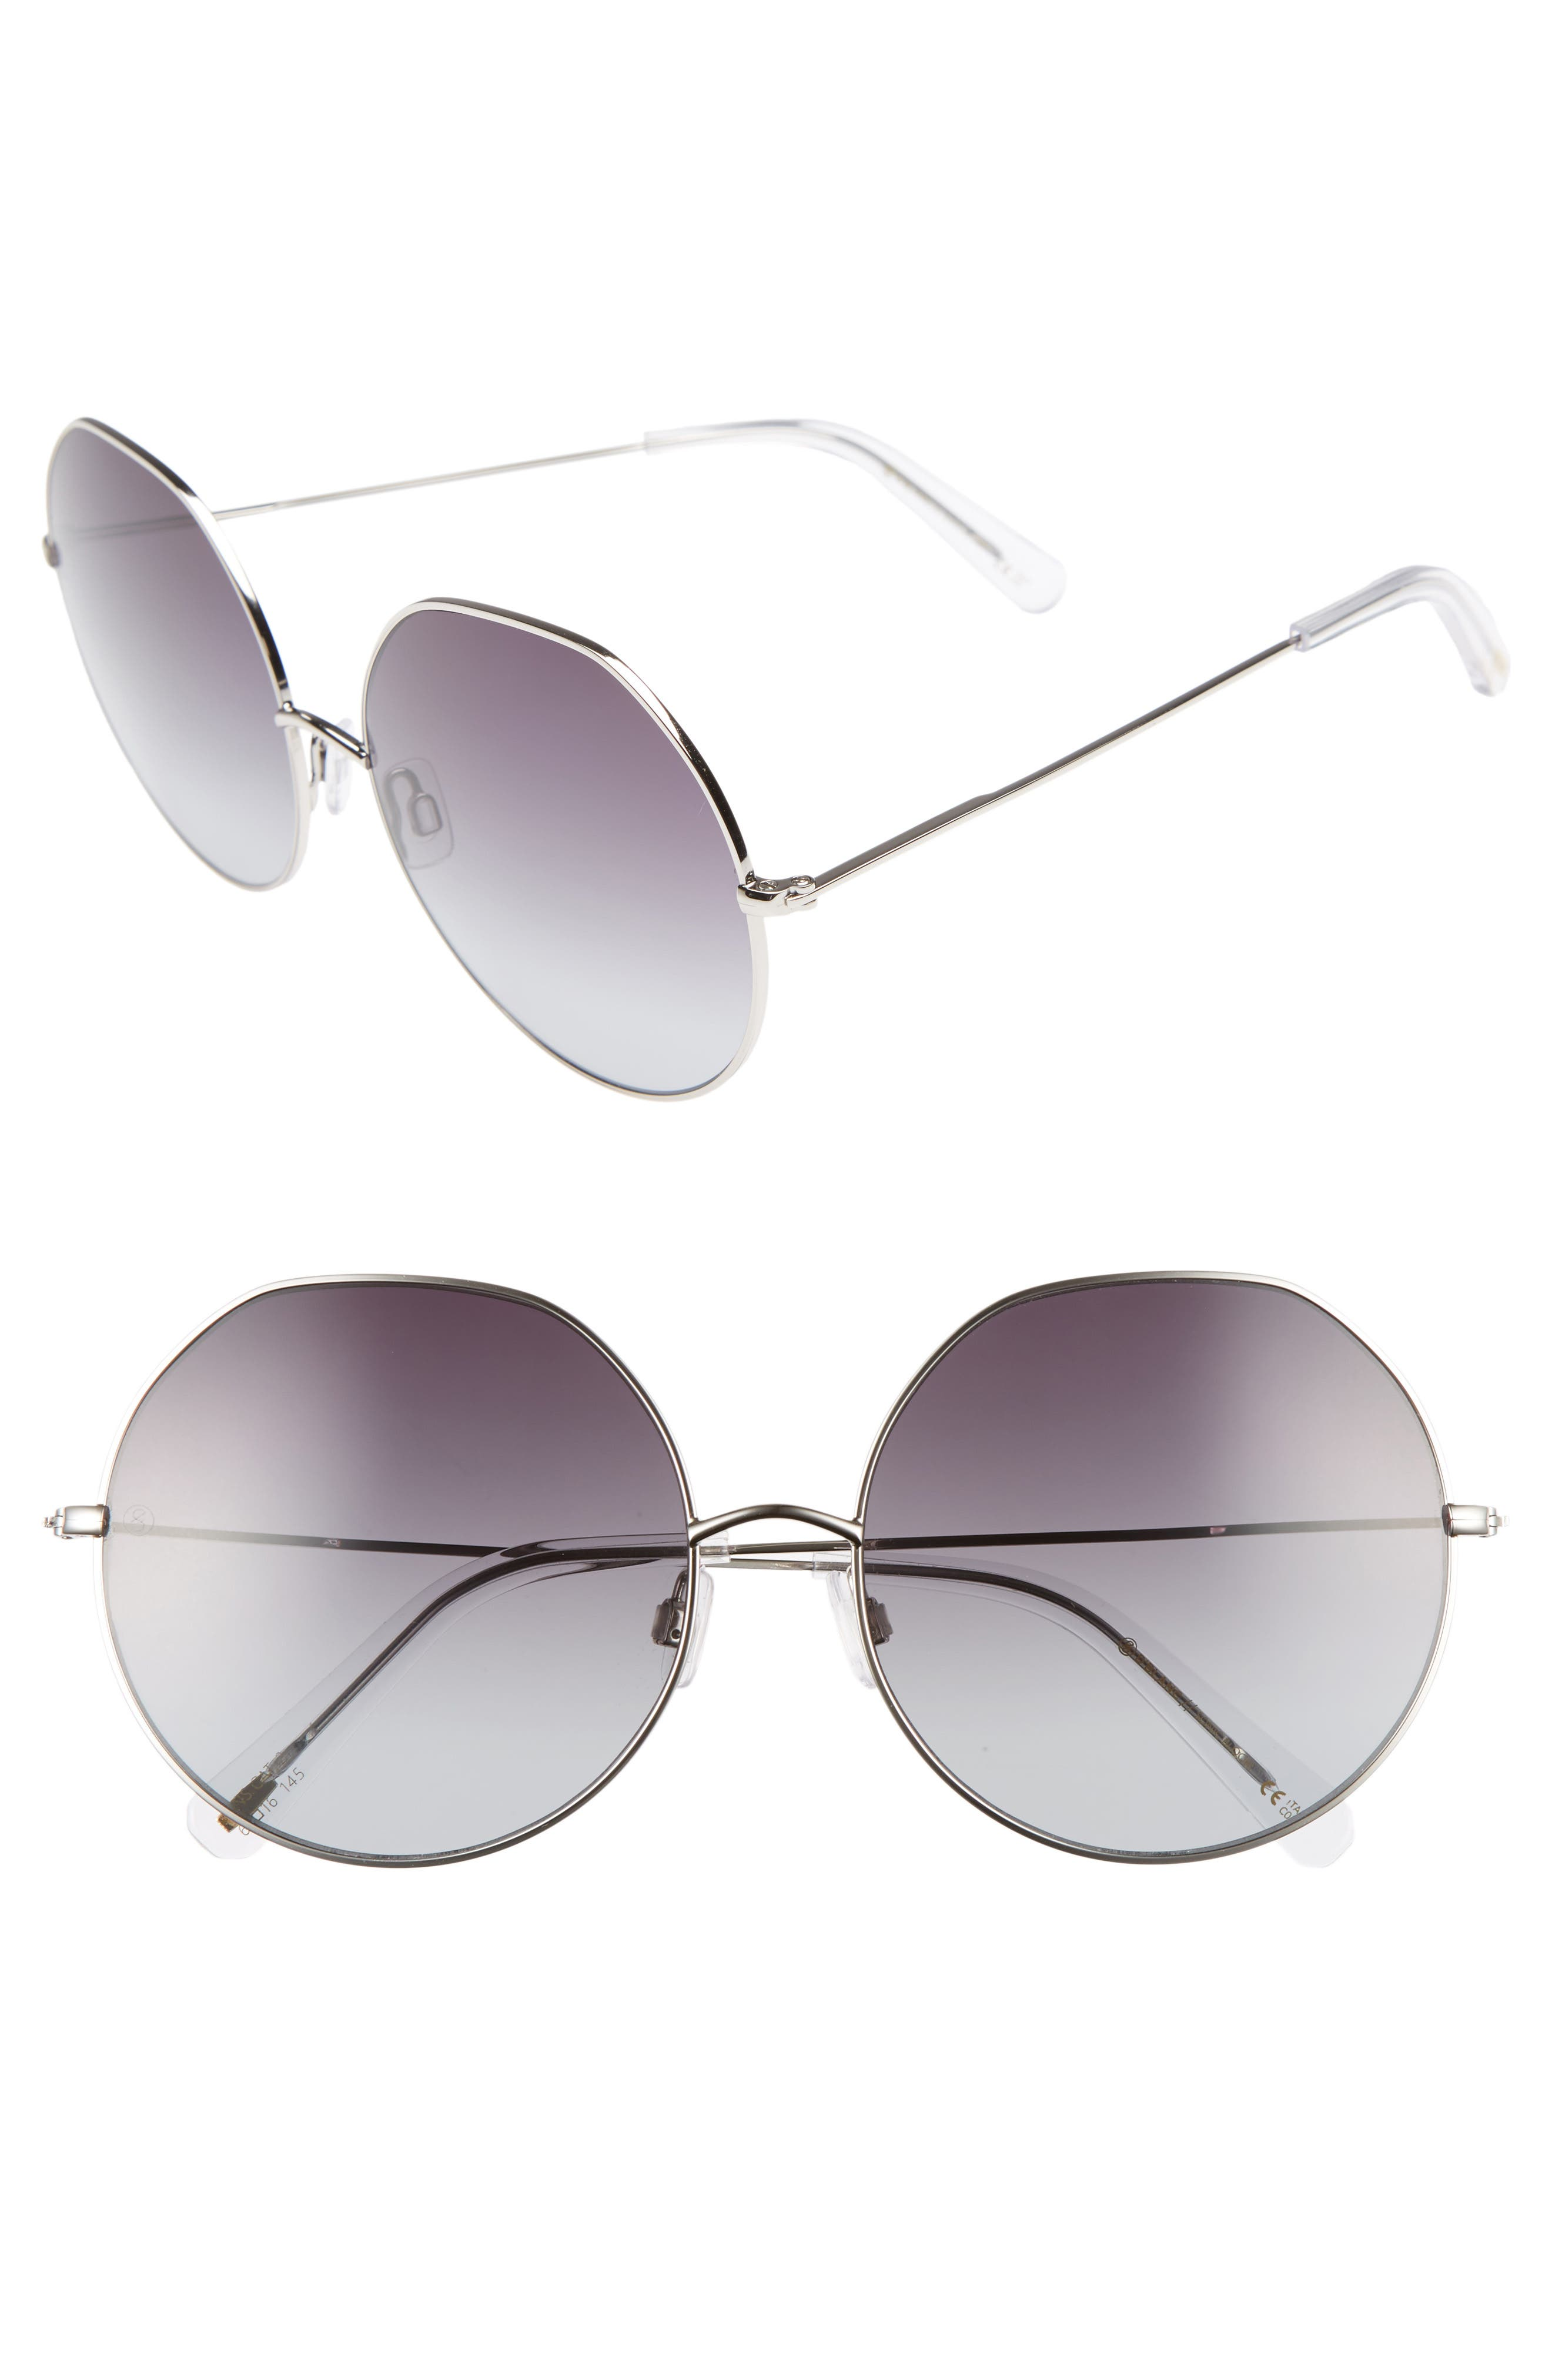 D'BLANC Sonic Boom 62mm Gradient Round Sunglasses